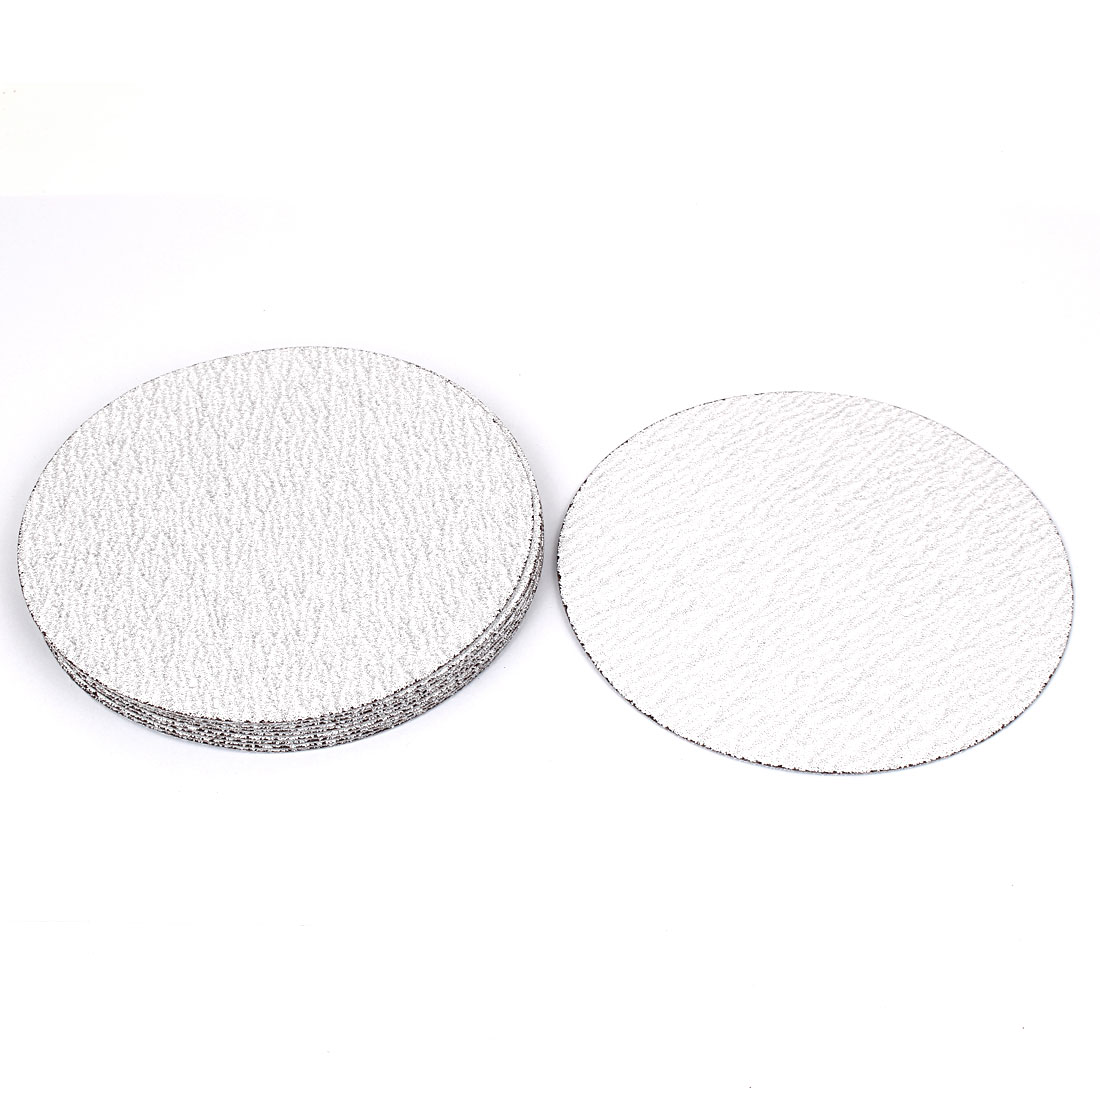 "6"" Dia Polishing Round Dry Abrasive Sanding Sandpaper Sheet Disc 120 Grit 10 Pcs"